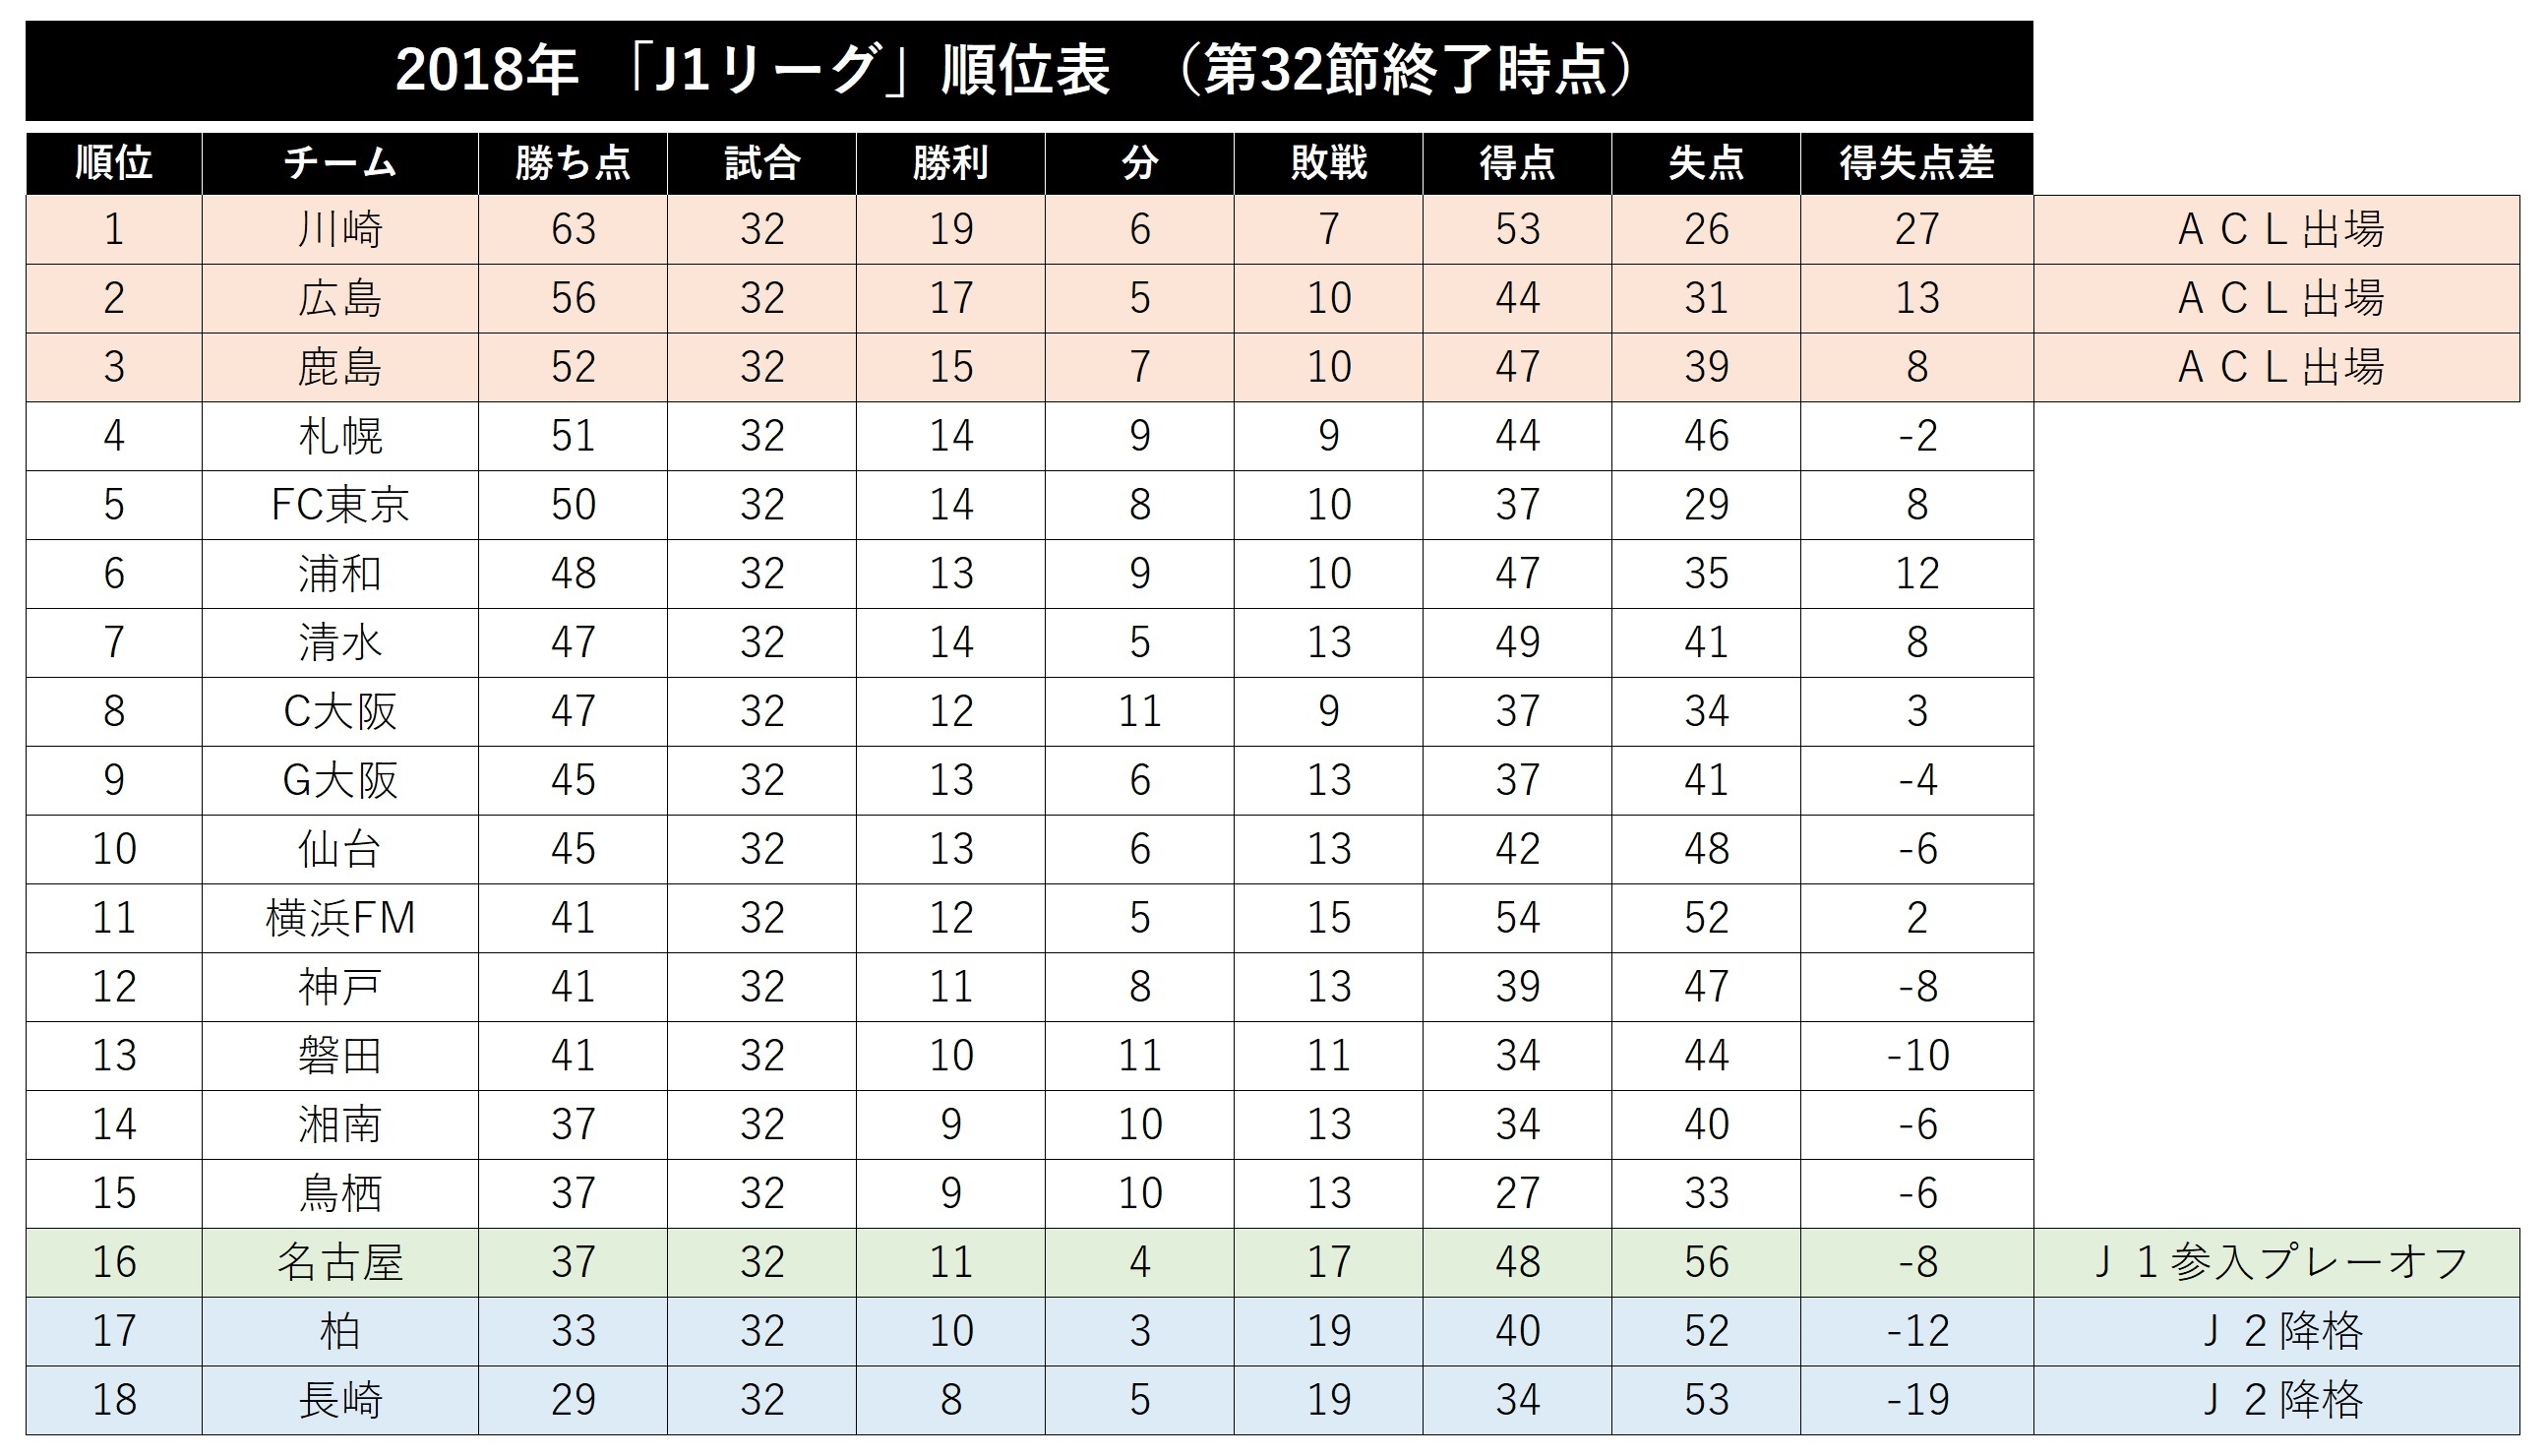 J1リーグ第32節終了時の順位表【表:Football ZONE web】